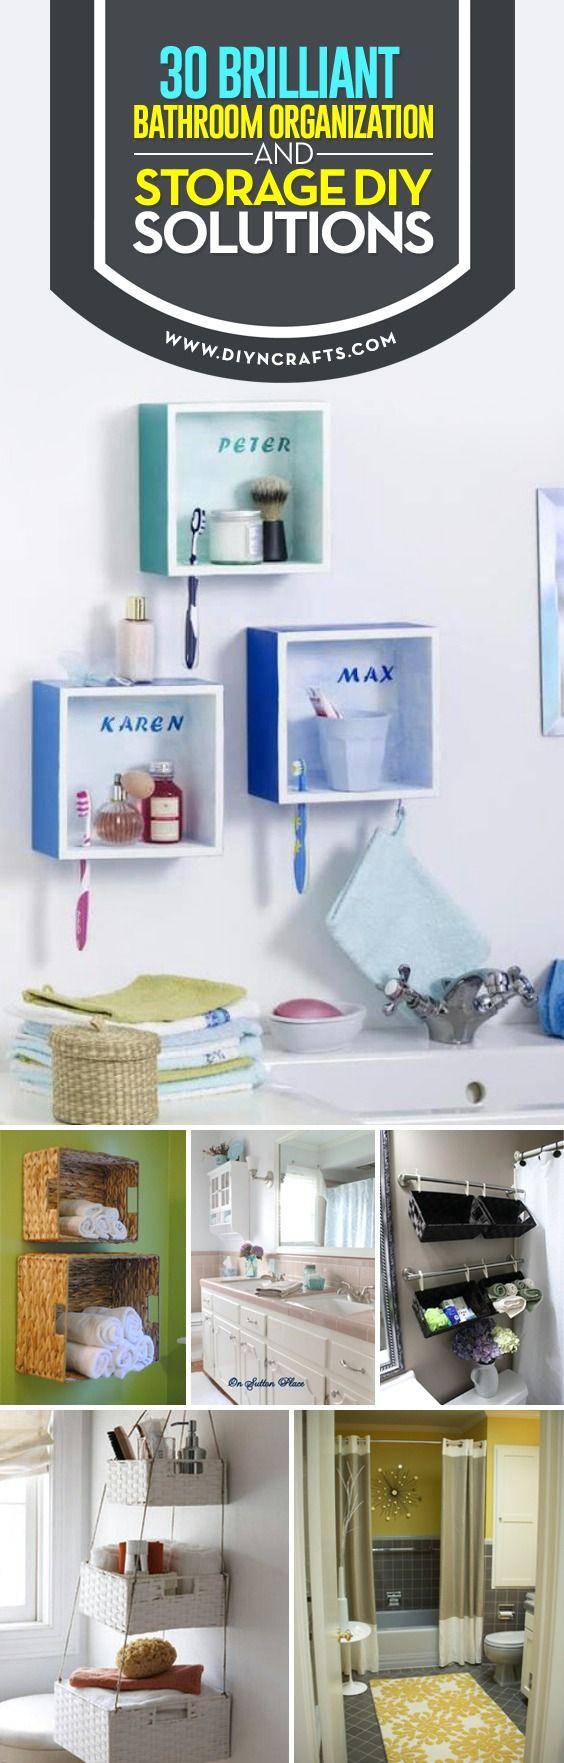 30 Brilliant #Bathroom #Organization and Storage #DIY Solutions via @vanessacrafting